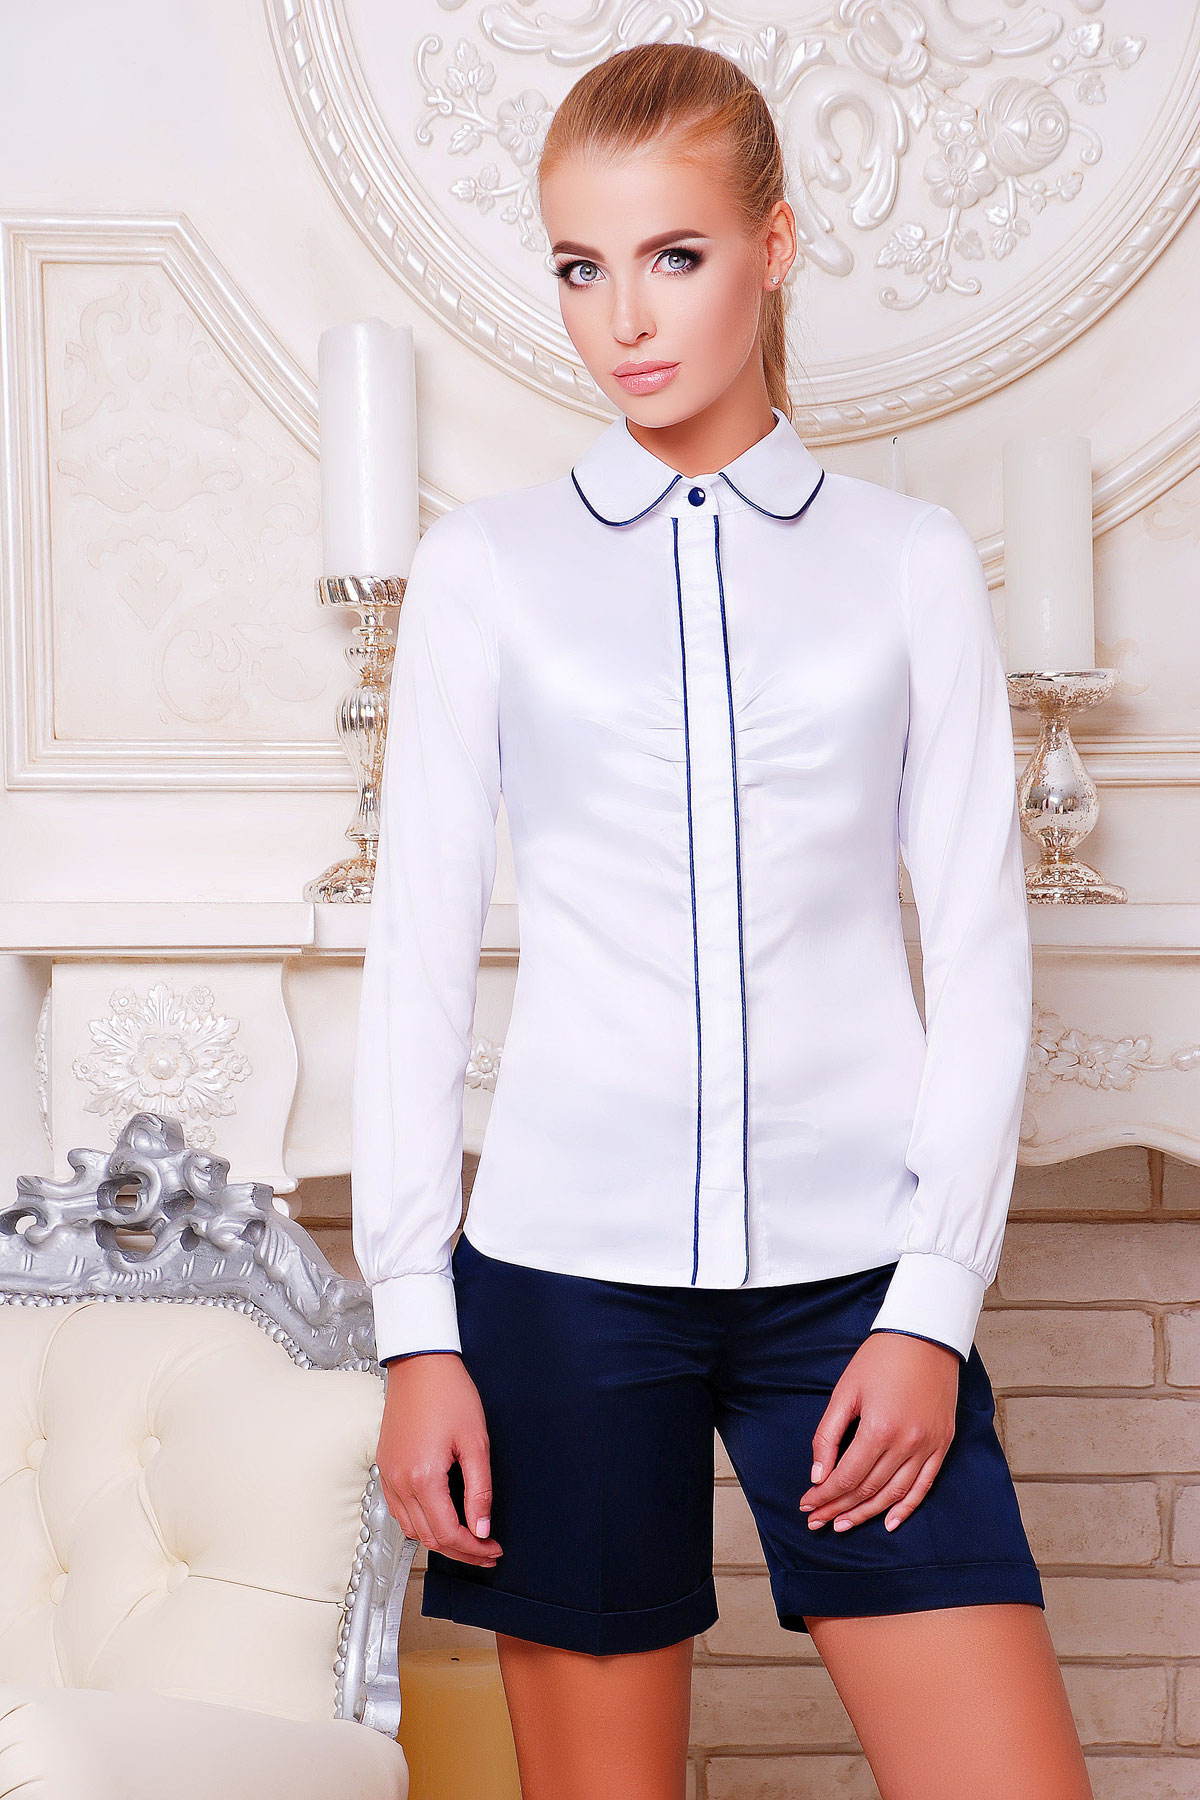 Где купить белую блузку